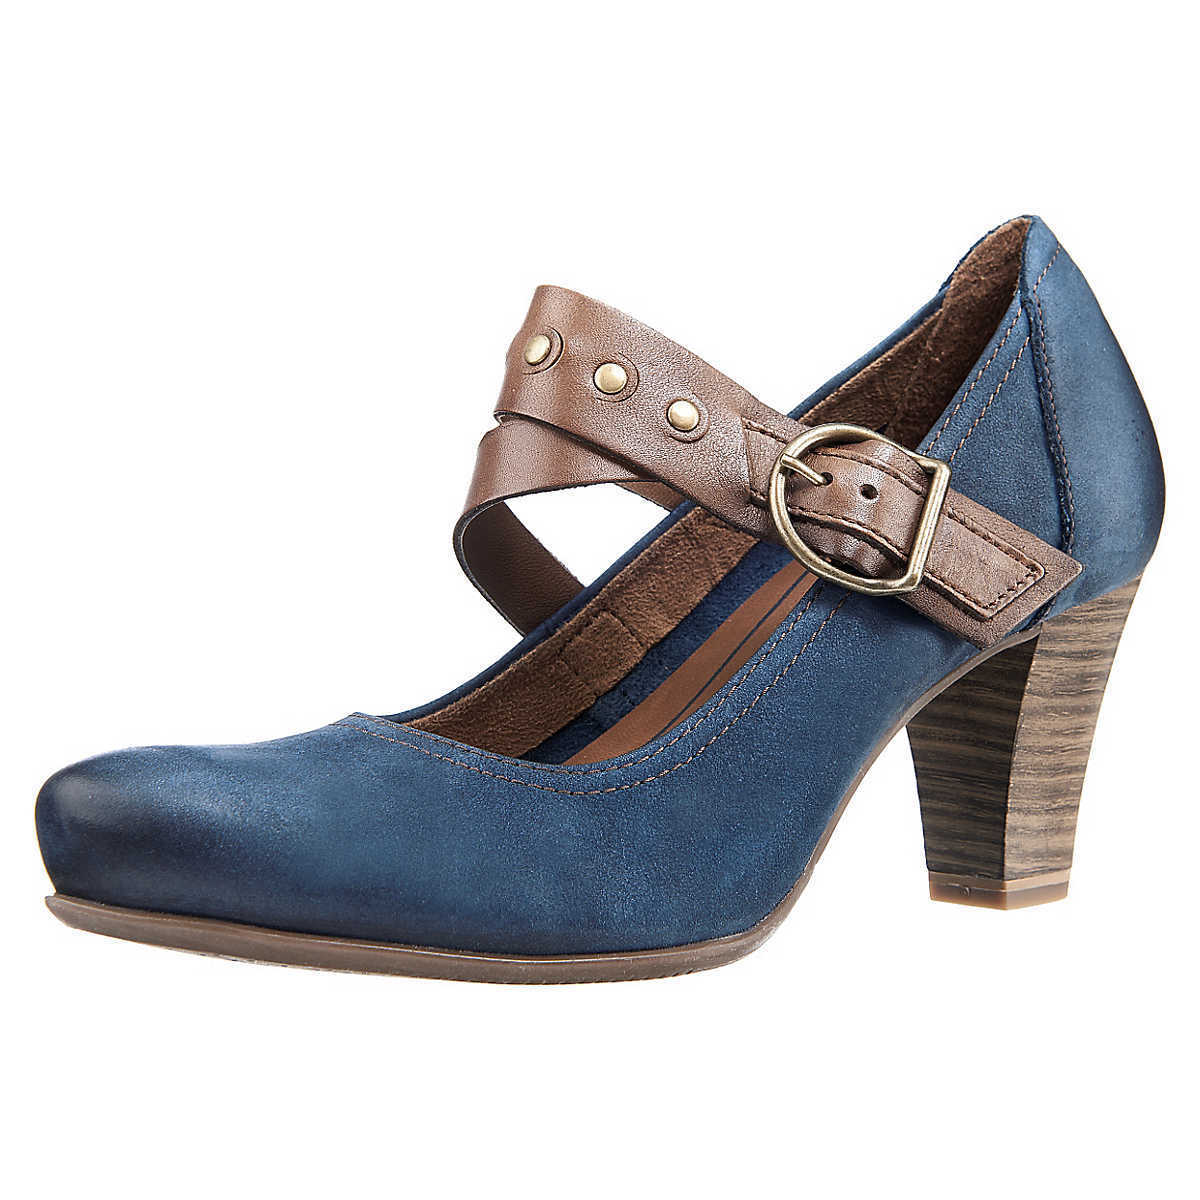 TAMARIS 3462647 Damen Pumps Damenschuhe blau, Gr. 41,